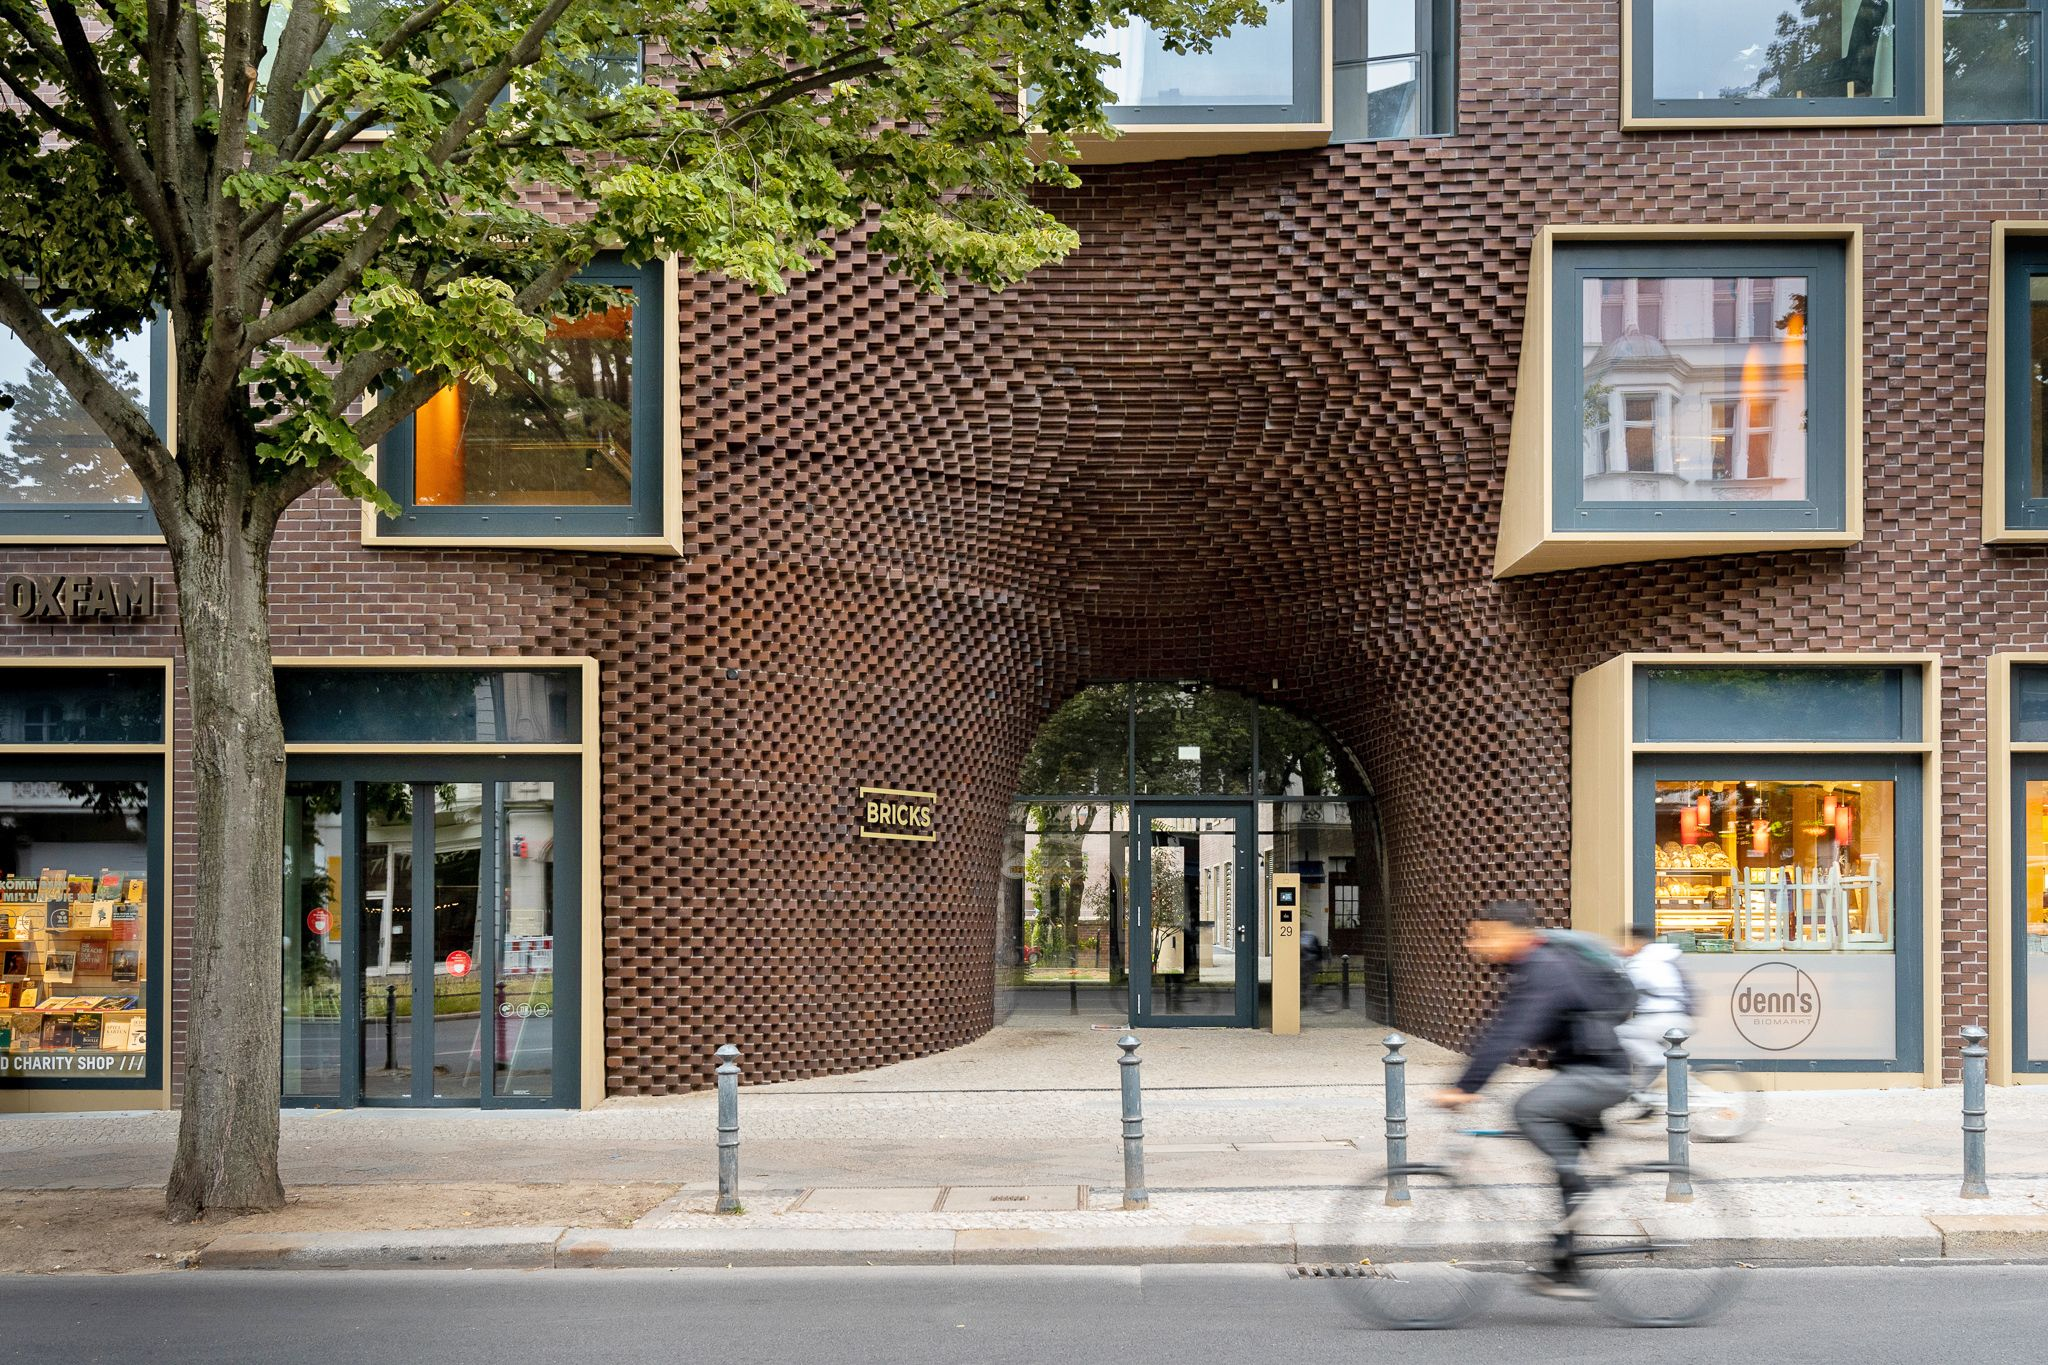 Bricks Berlin Schoeneberg